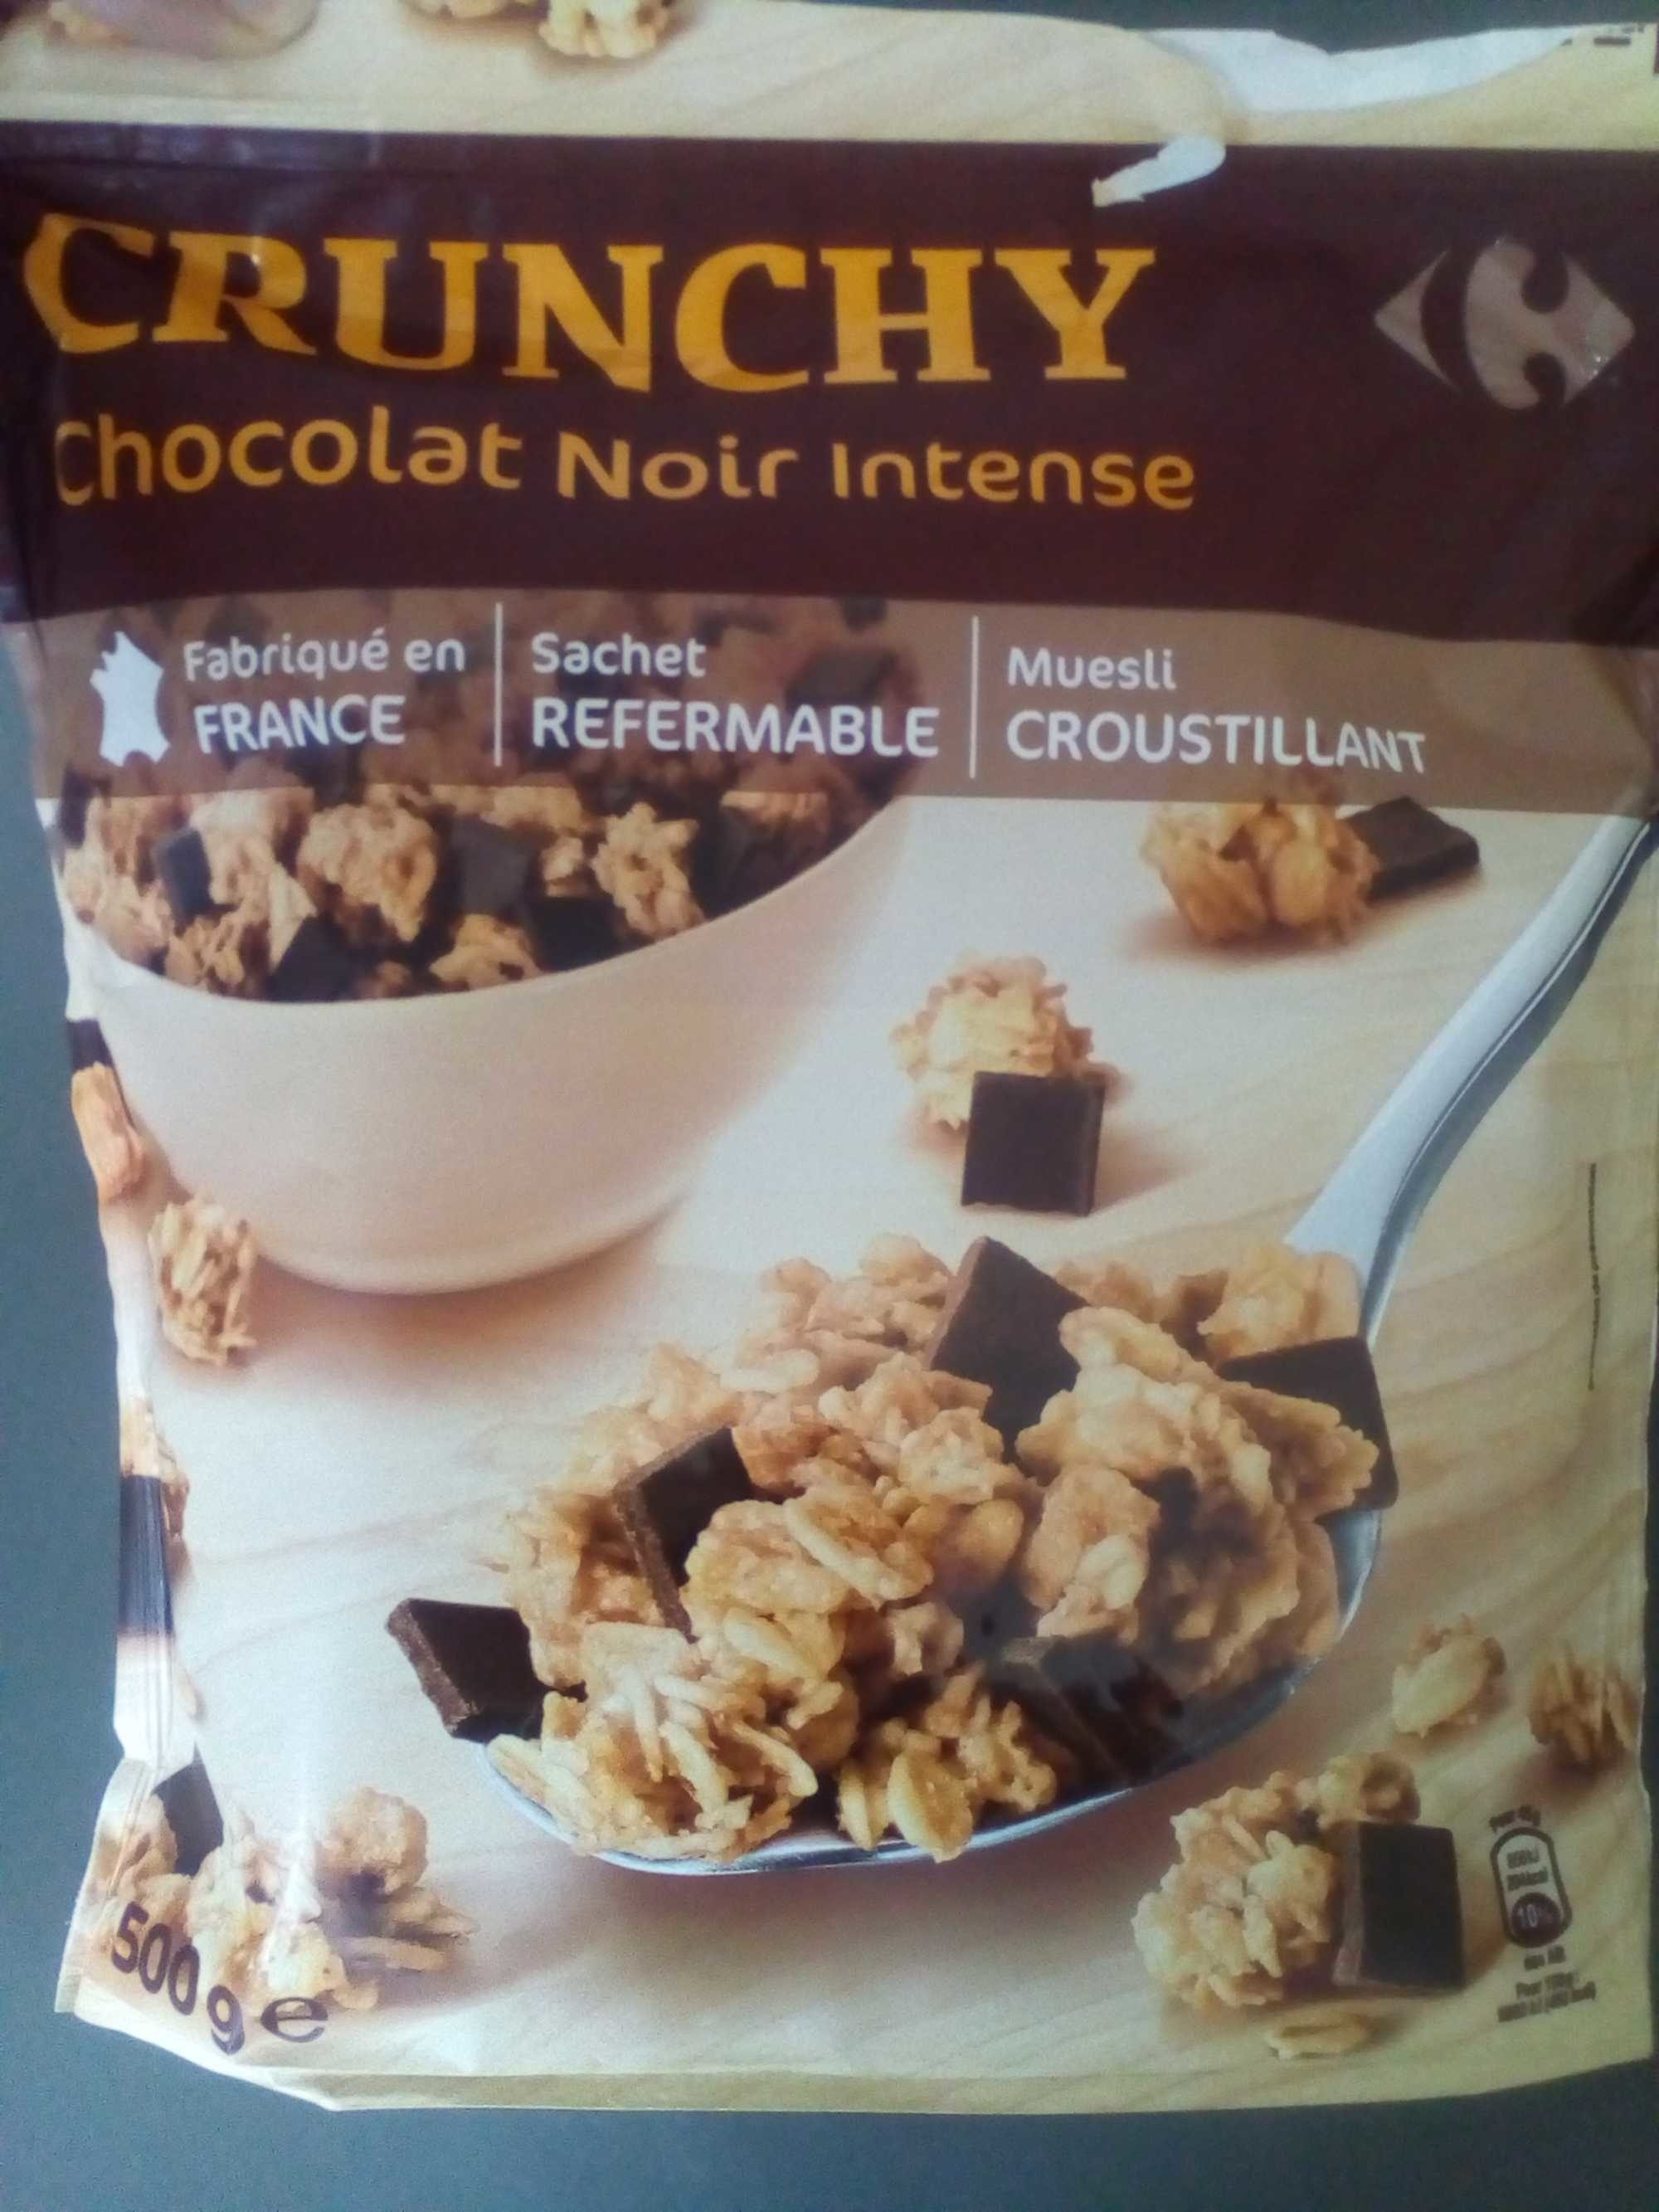 Crunchy Chocolat Noir Intense Carrefour 500g